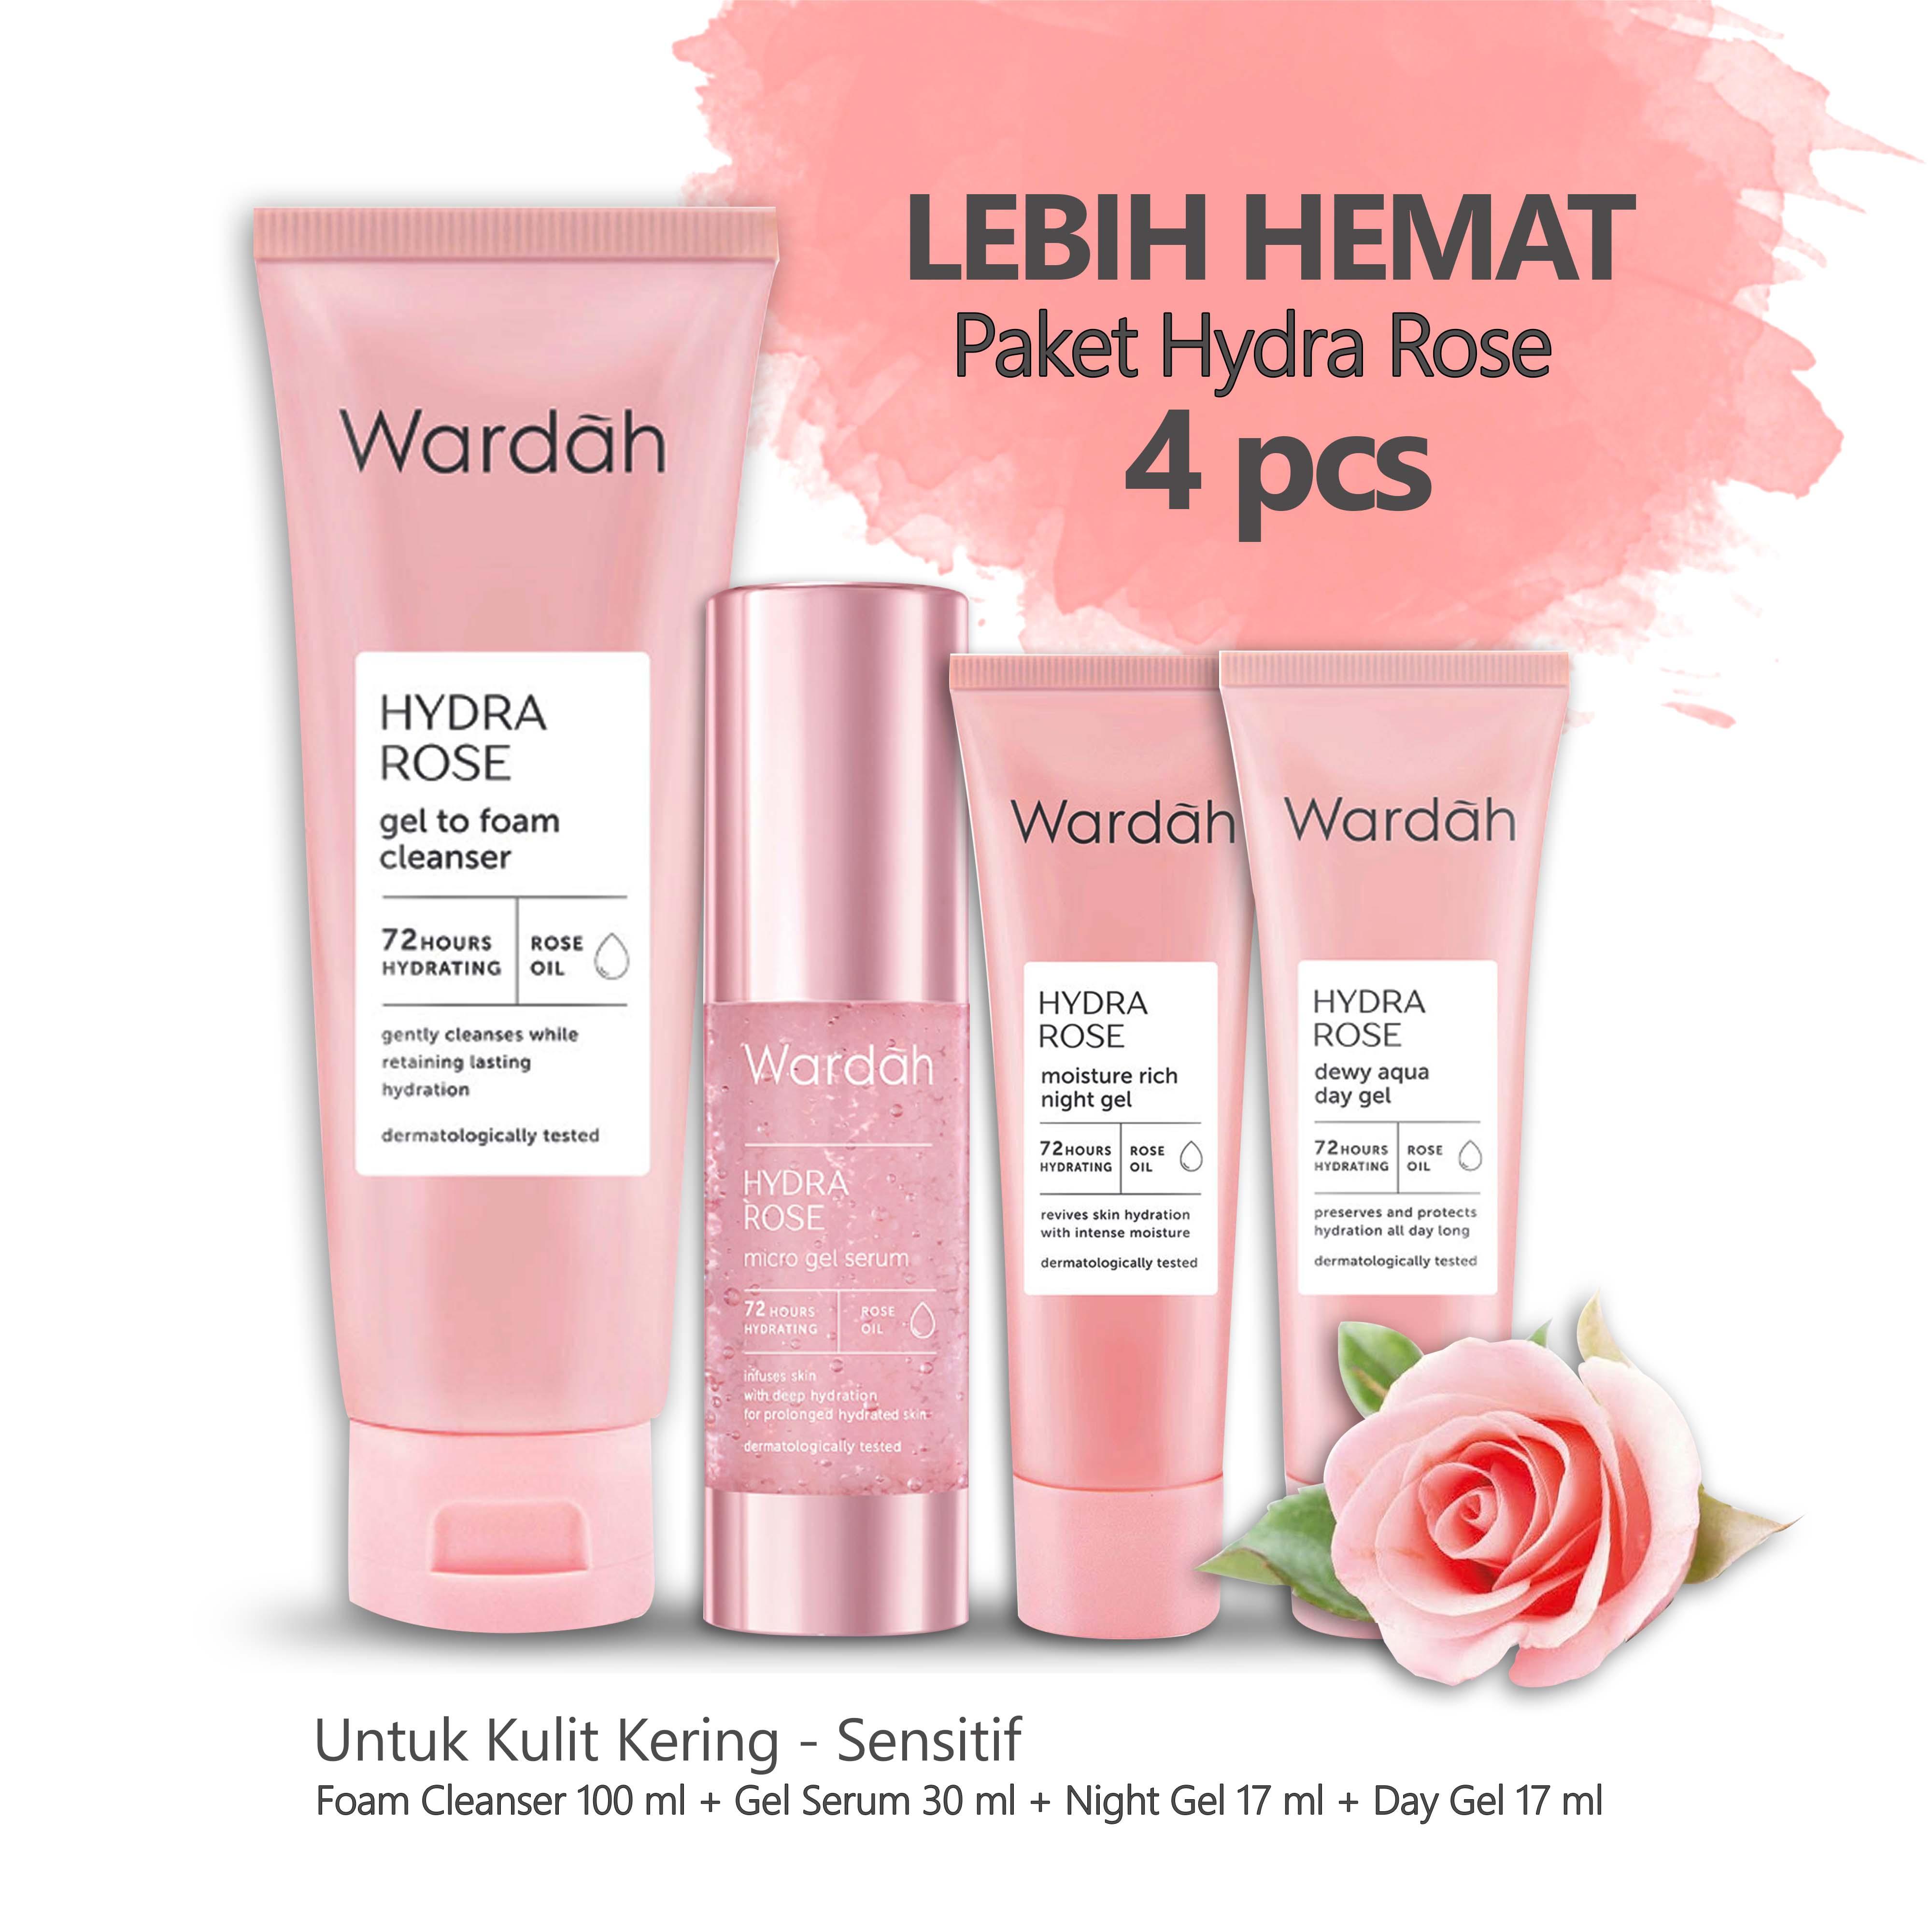 Paket Spesial Wardah Hydra Rose 4 Pcs Foam Cleanser 100 Ml Gel Serum 30 Ml Night Gel 17 Ml Day Gel 17 Ml Kemasan Kecil Lazada Indonesia